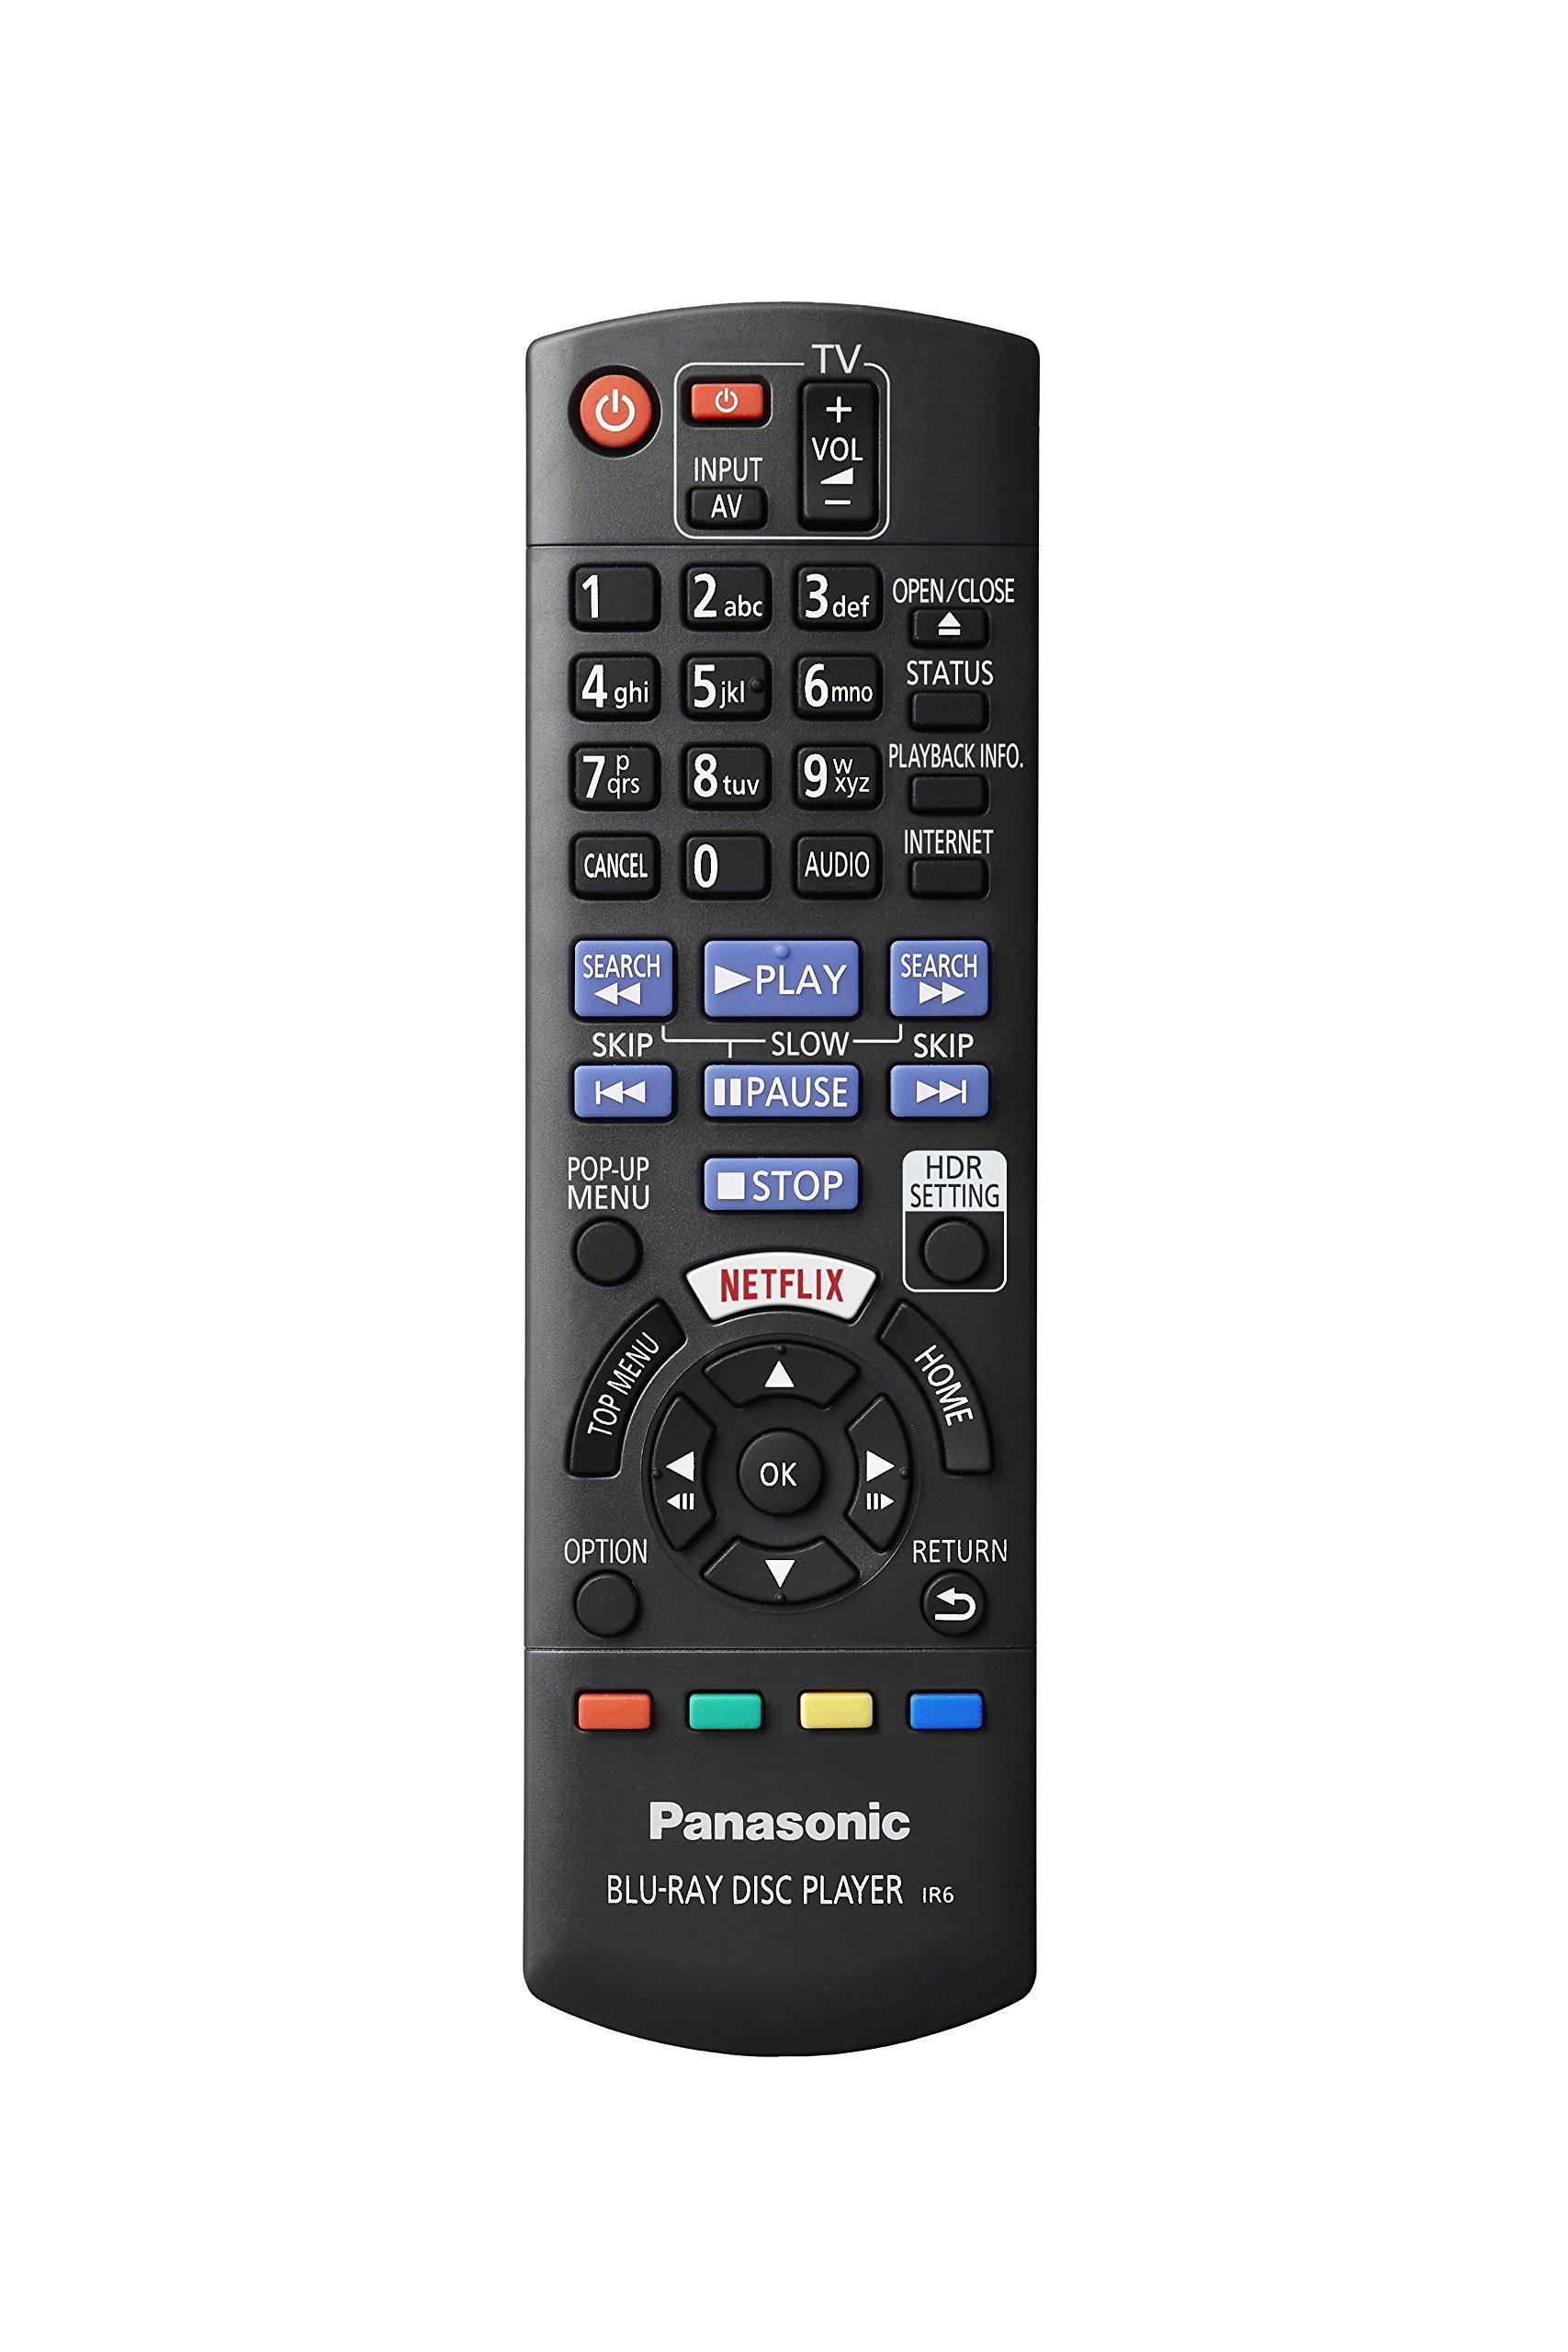 81AmgX4hC8L - Panasonic DP-UB820EB-K Ultra HD Blu-Ray Player - Black